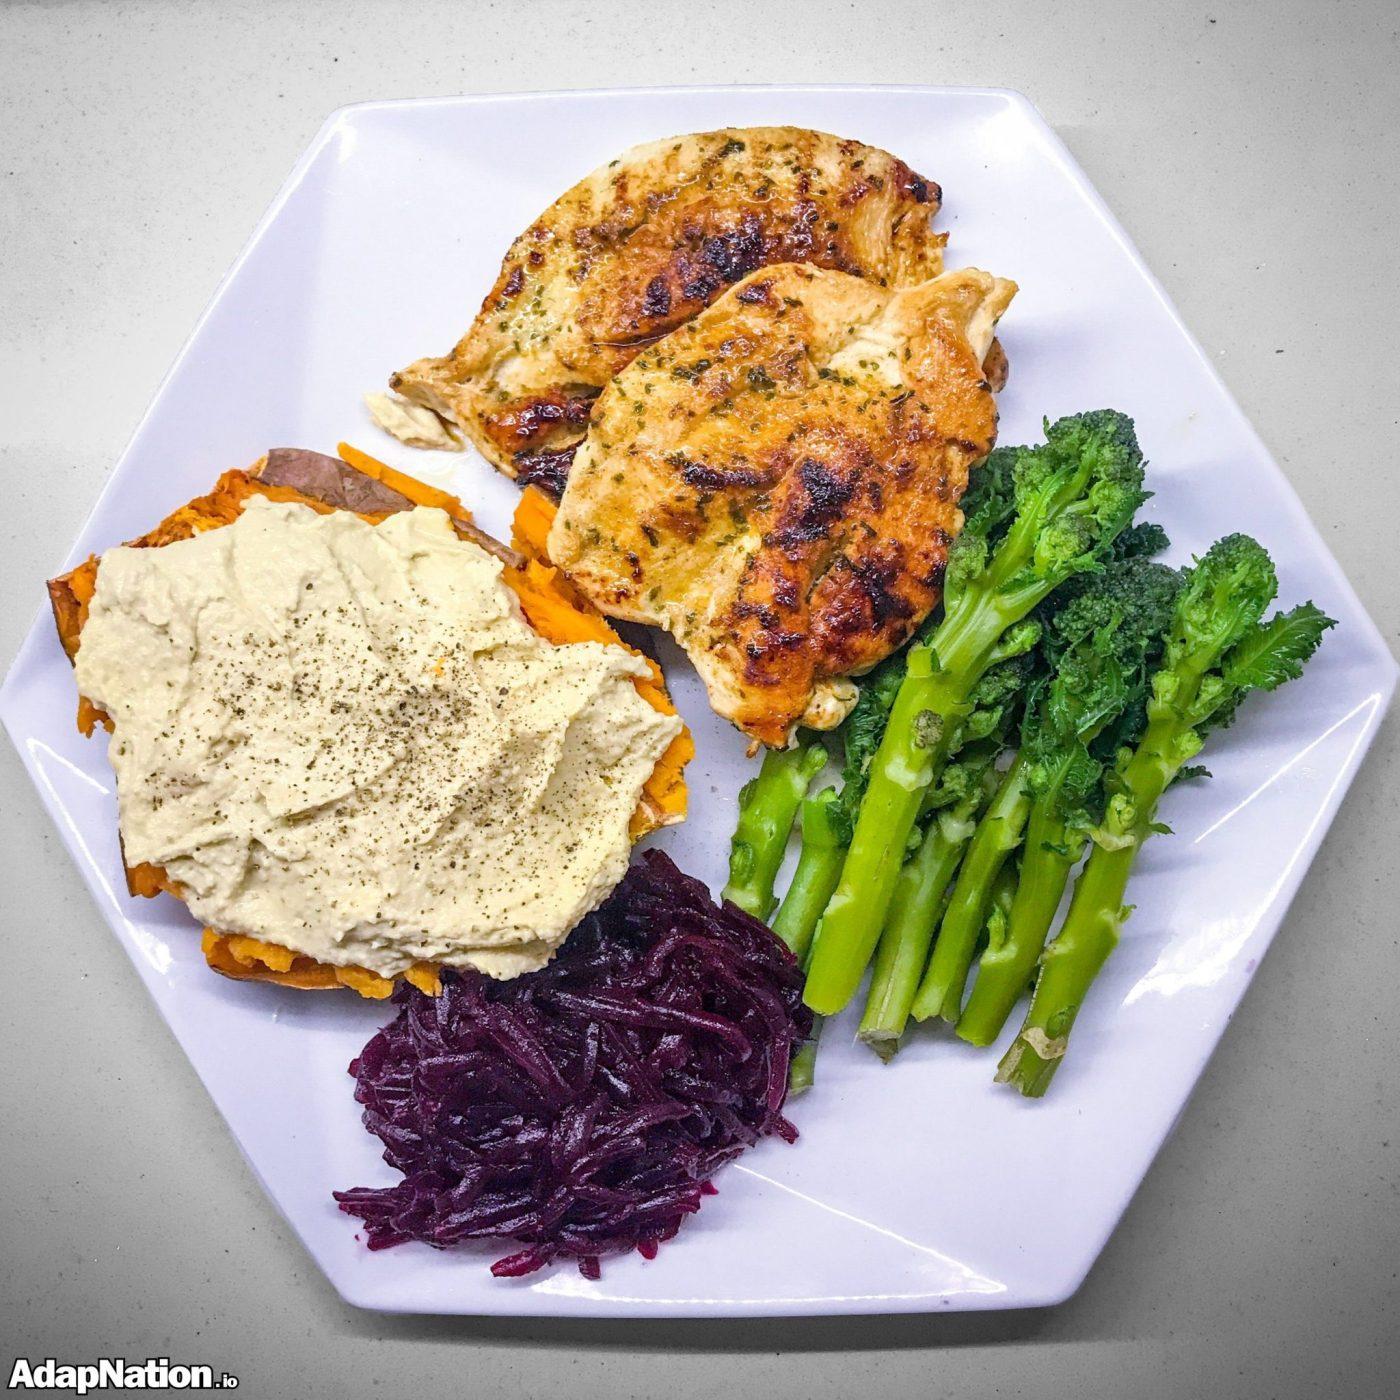 Chicken, Sweet Potato, Hummus, Beetroot and Broccoli